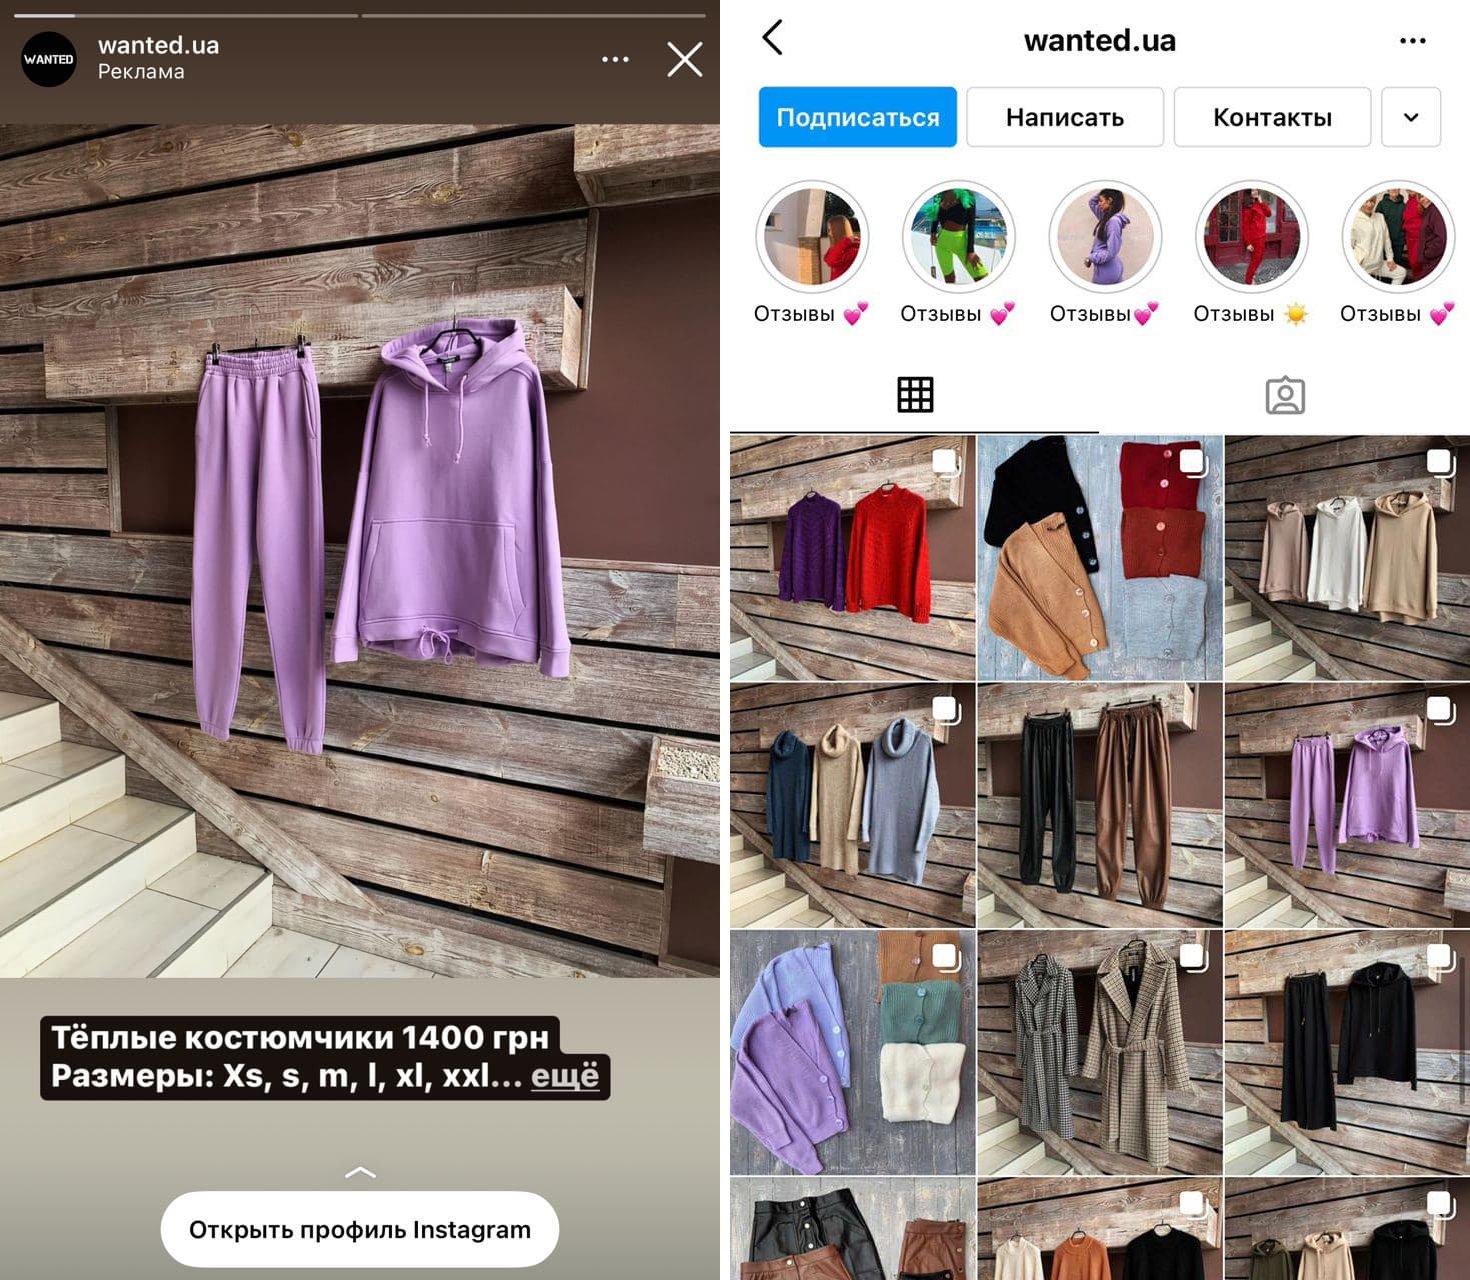 Instagram ads - profile